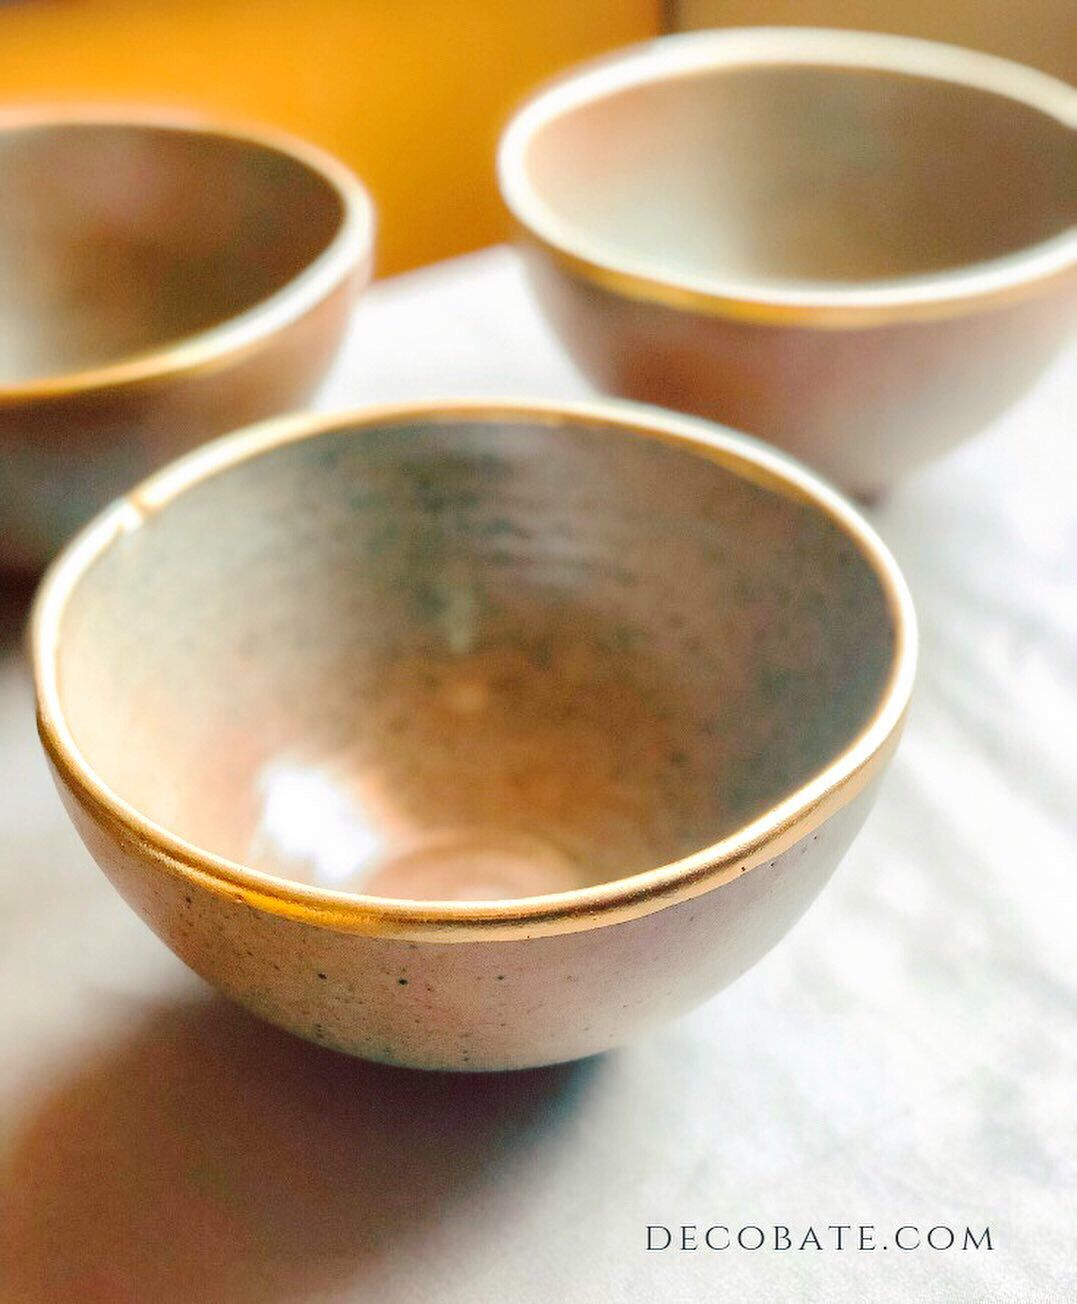 handmade ceramic ceramics pottery tableware dinnerware bowl bowls fine art